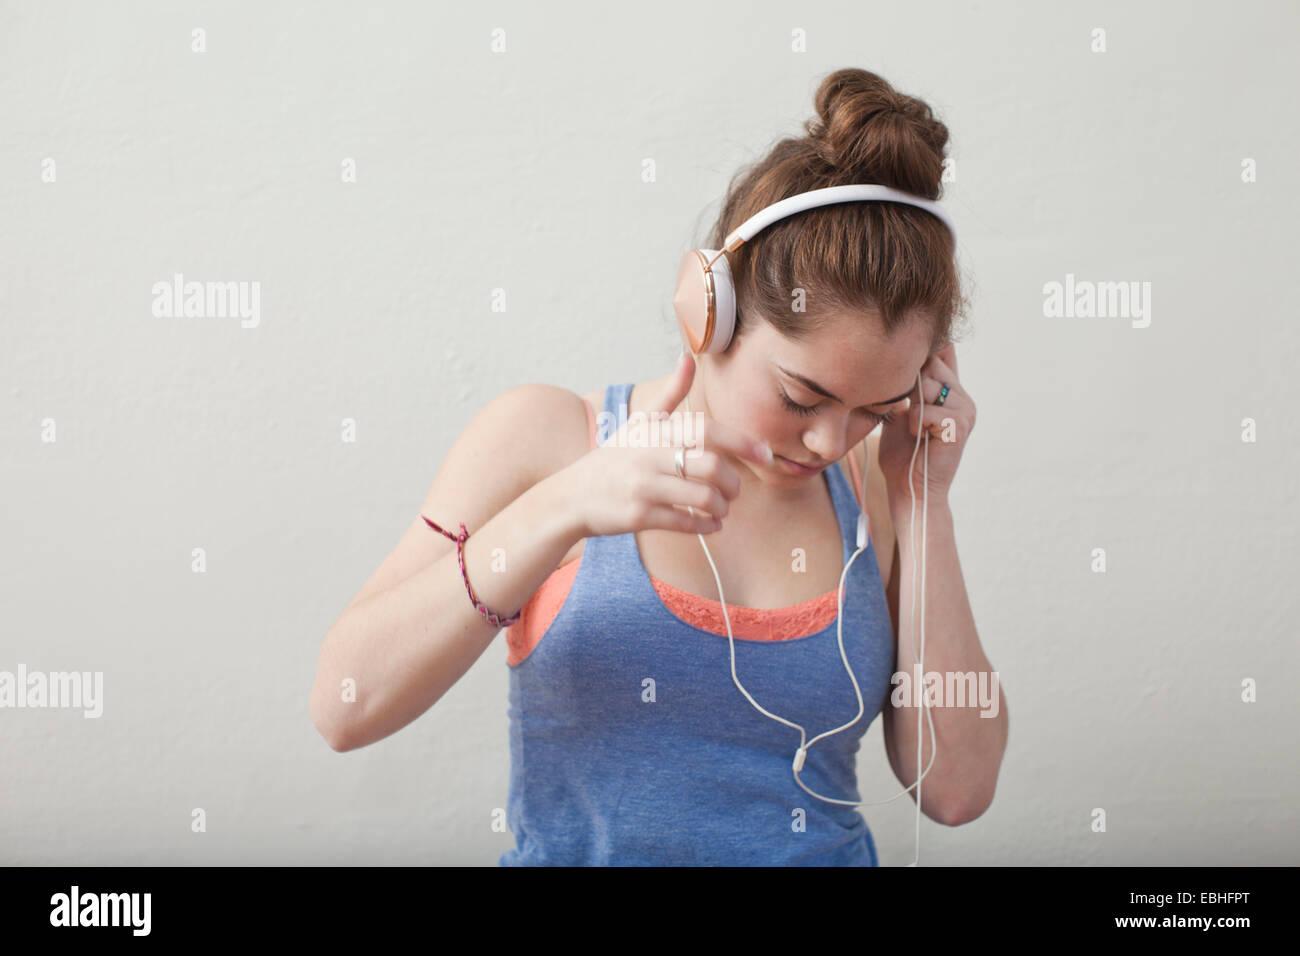 Teenager-Mädchen hören über Kopfhörer in der Ballettschule Stockbild